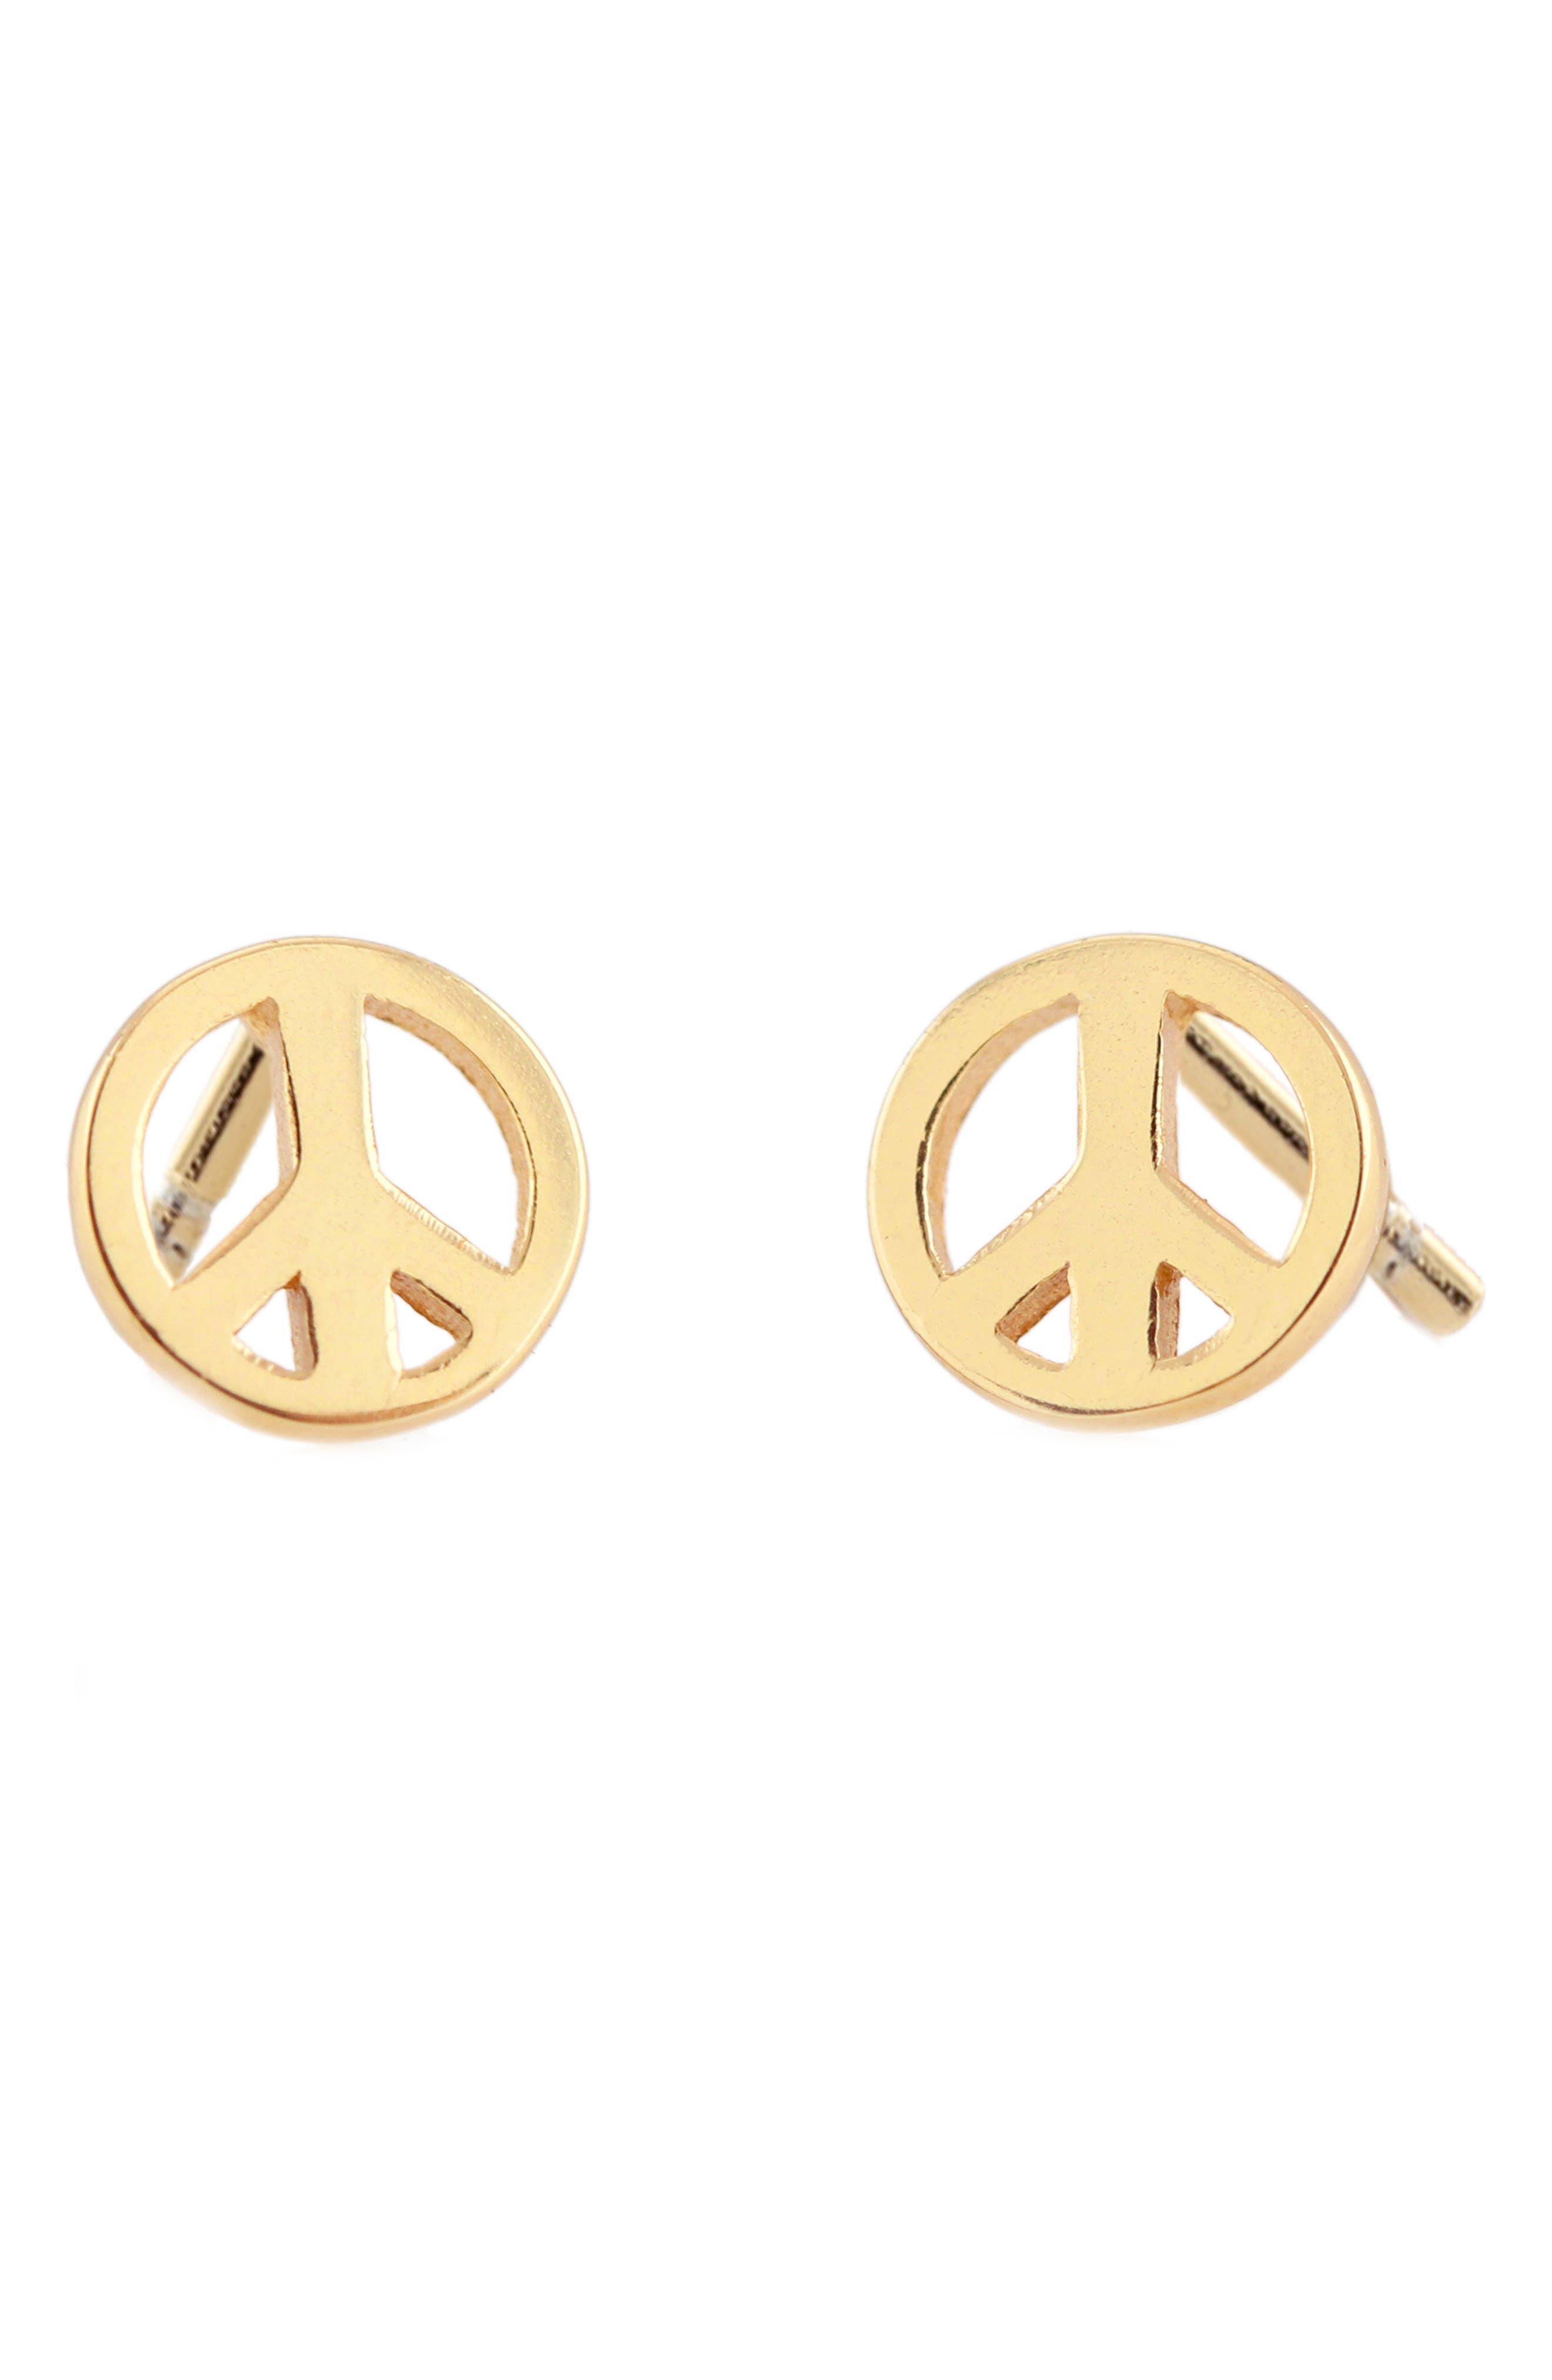 60s -70s Jewelry – Necklaces, Earrings, Rings, Bracelets Womens Kris Nations Peace Stud Earrings $40.00 AT vintagedancer.com